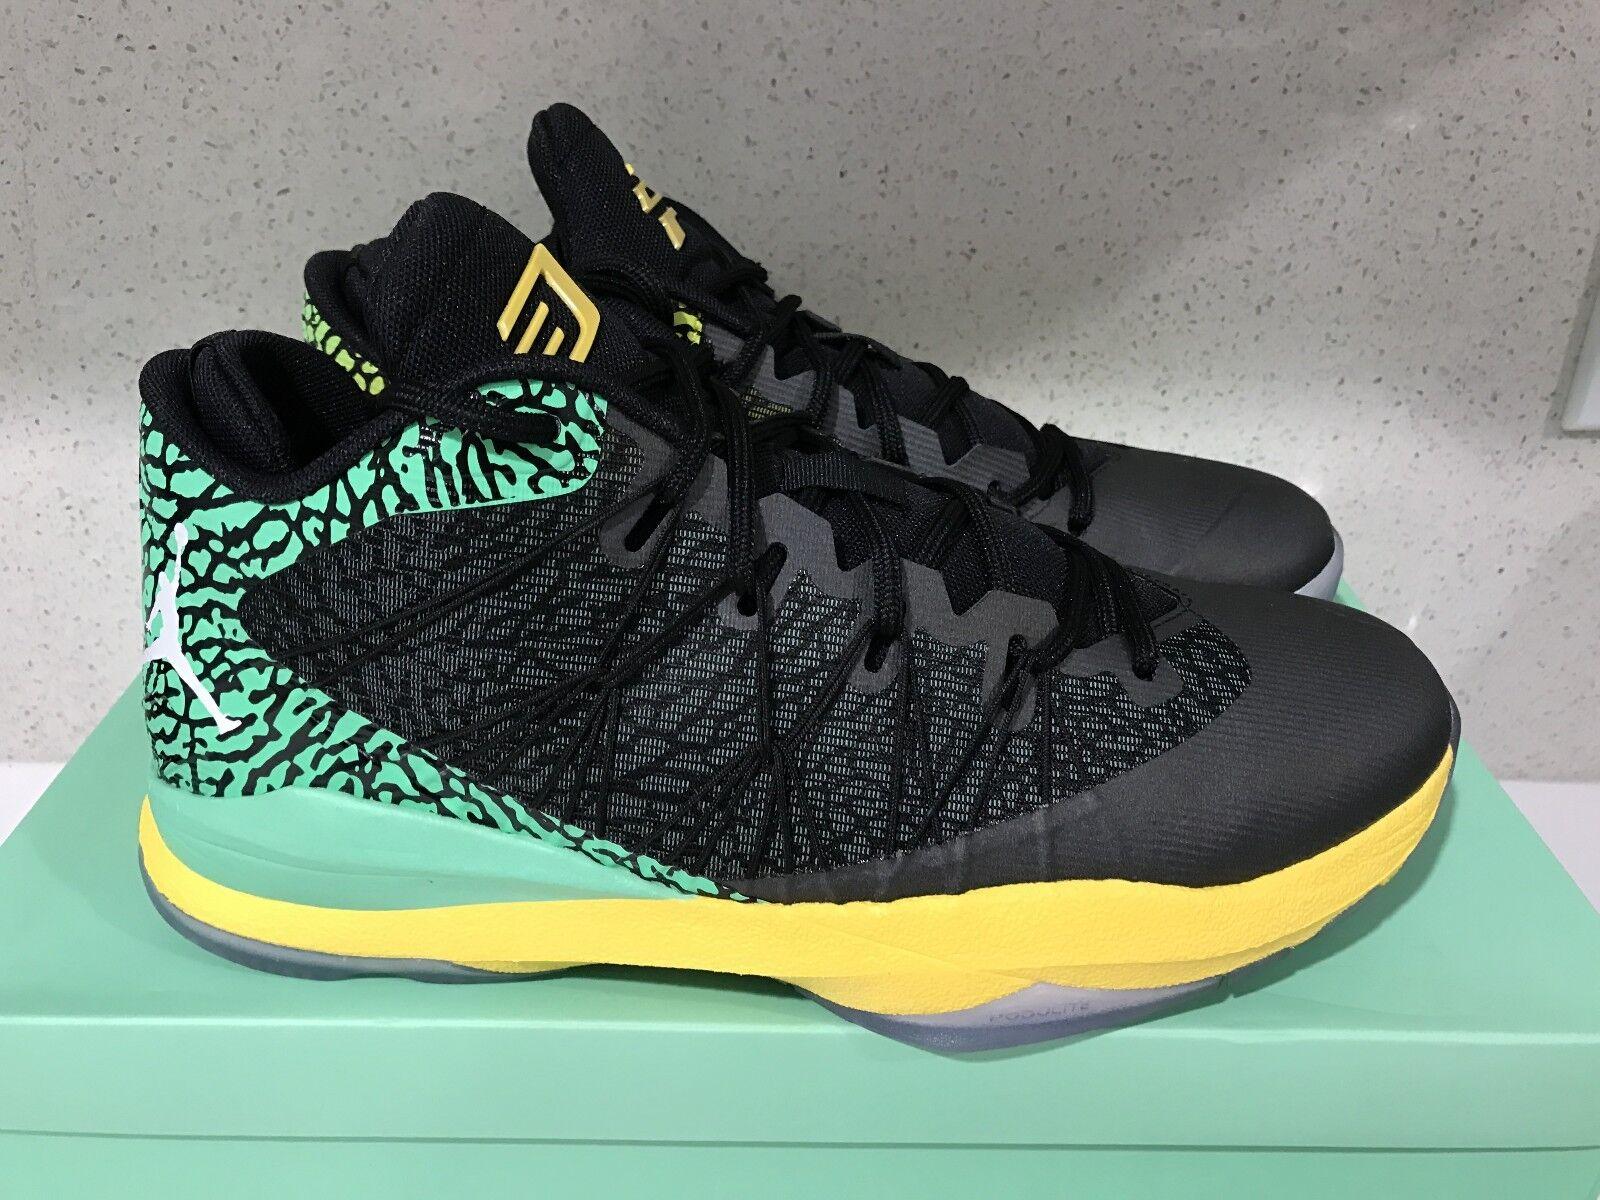 Nike Air Jordan CP3 9 7 VII AE tamaño 9 CP3 III Brasil Pack Retro 6 muestras db37ac